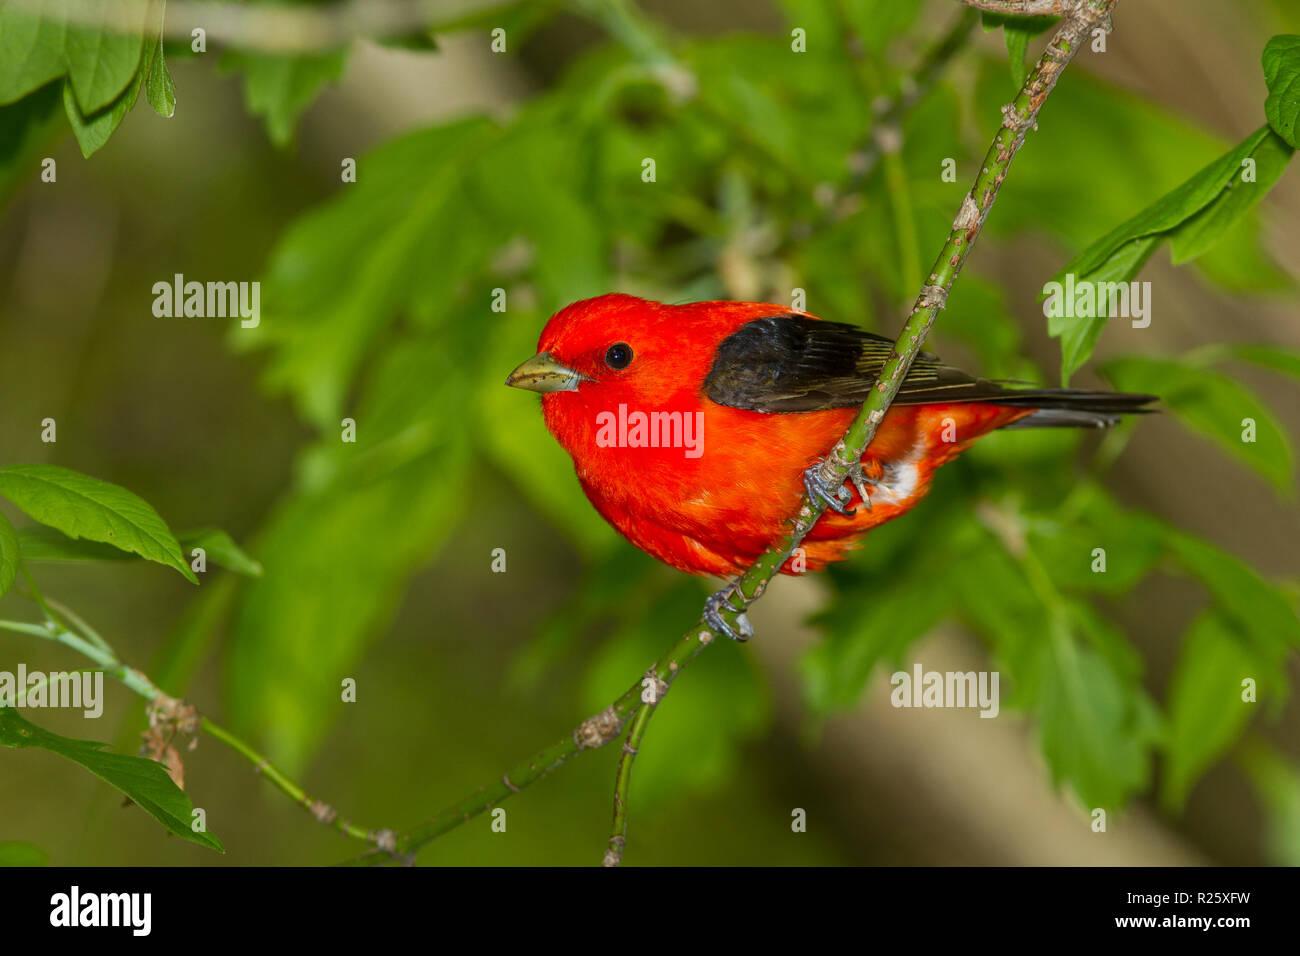 Scarlet Tanager (Piranga olivacea), male, breeding plumage - Stock Image